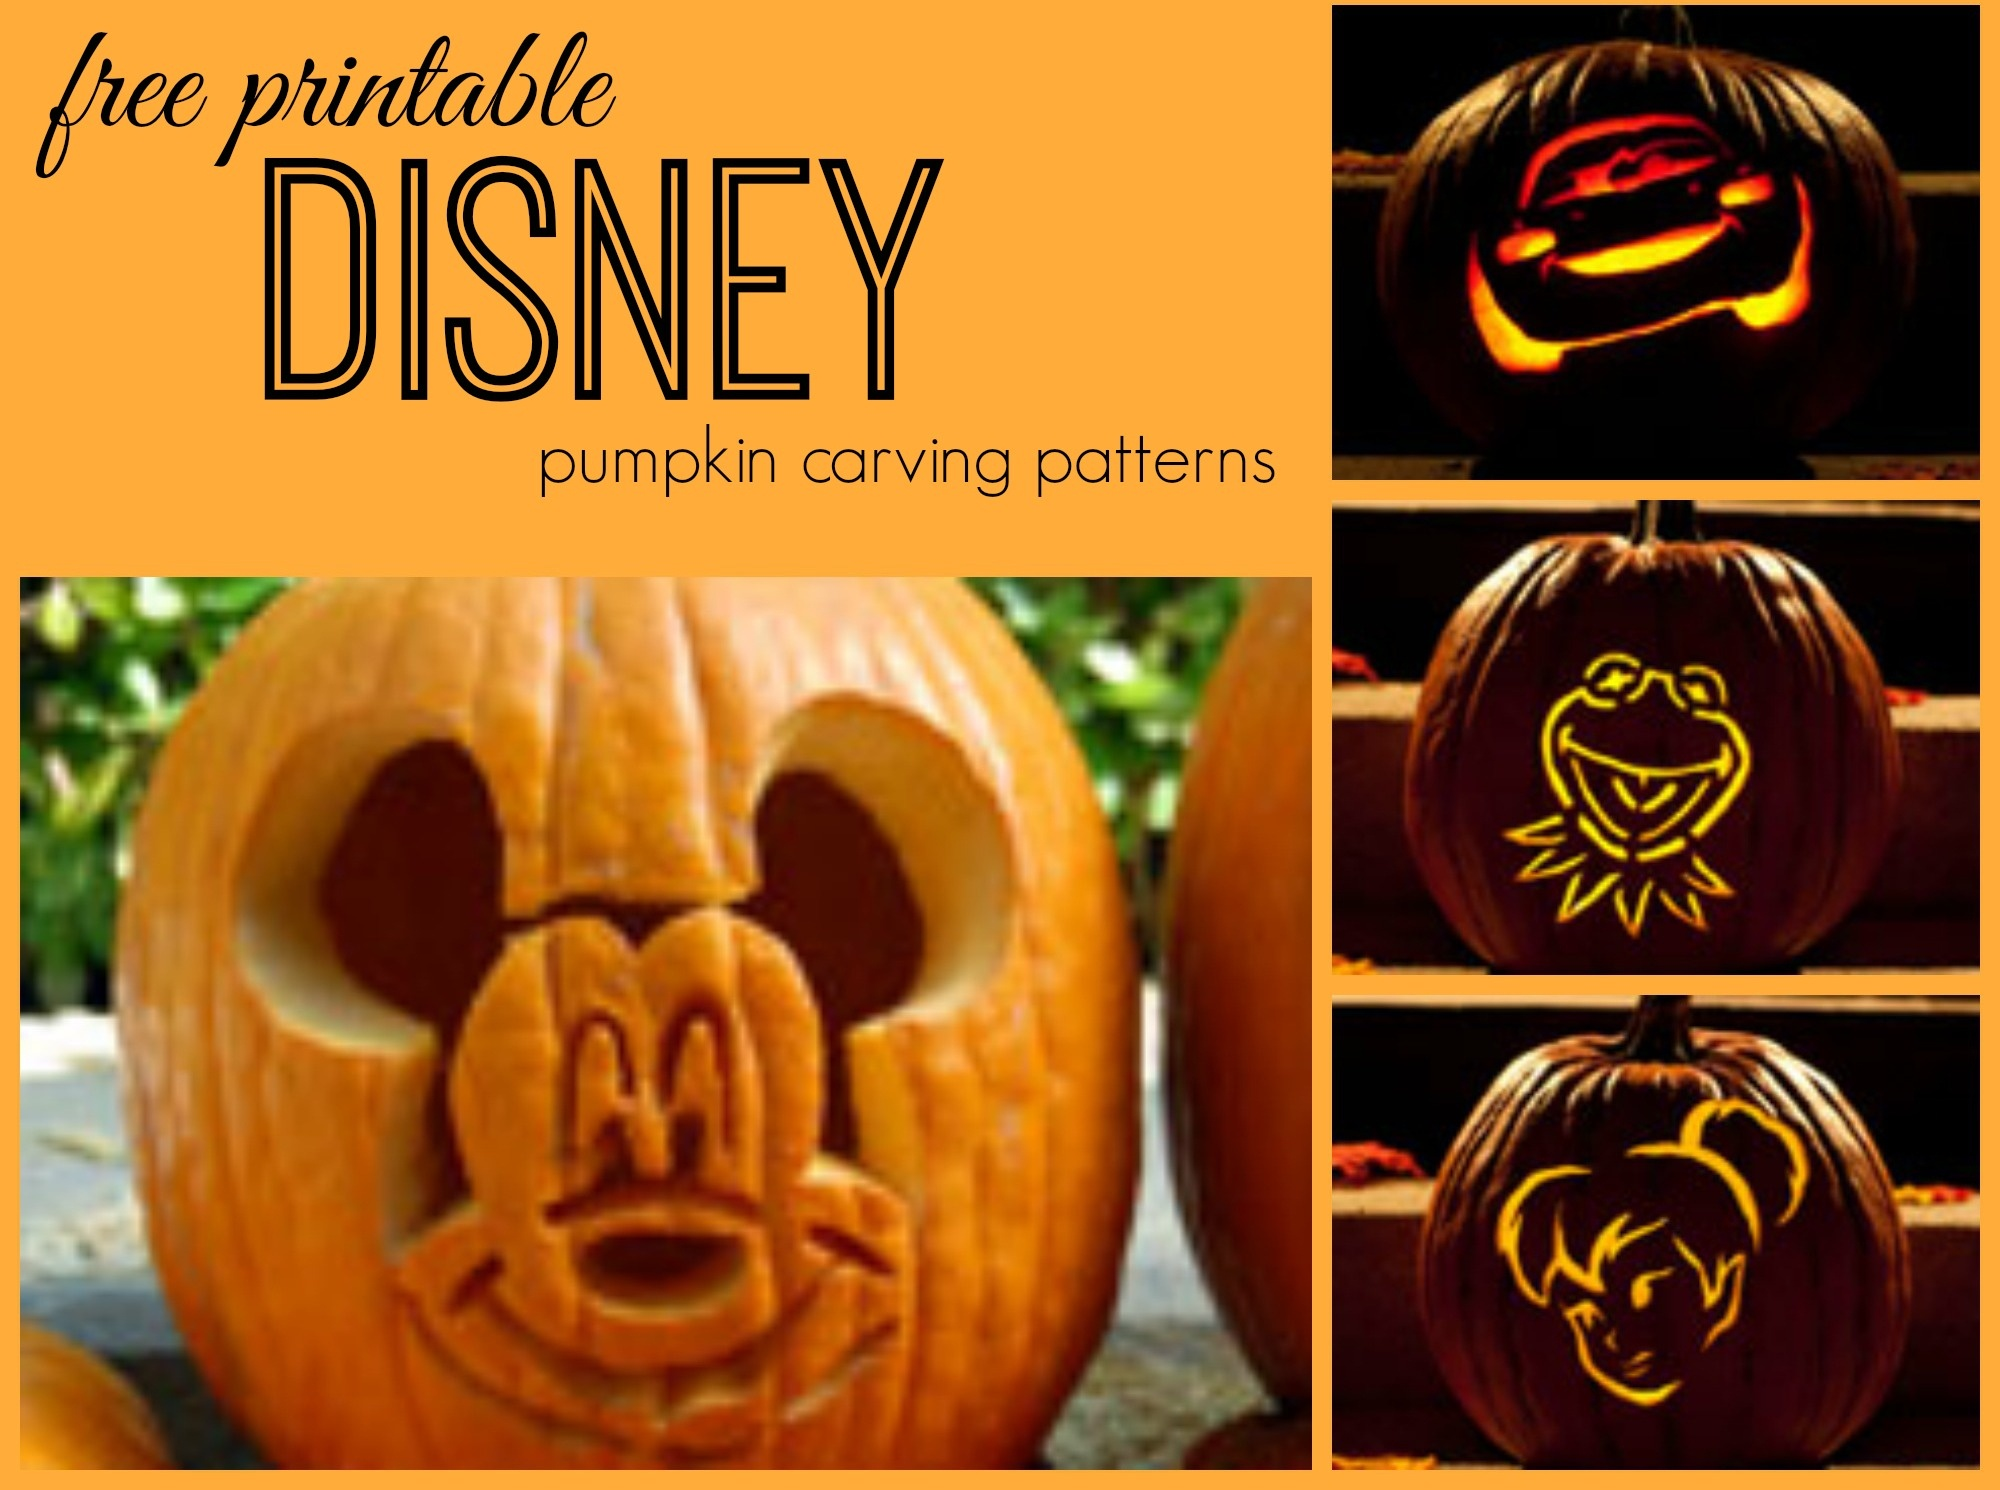 Disney Pumpkin Carving Patterns - Frugal Fanatic - Pumpkin Carving Patterns Free Printable